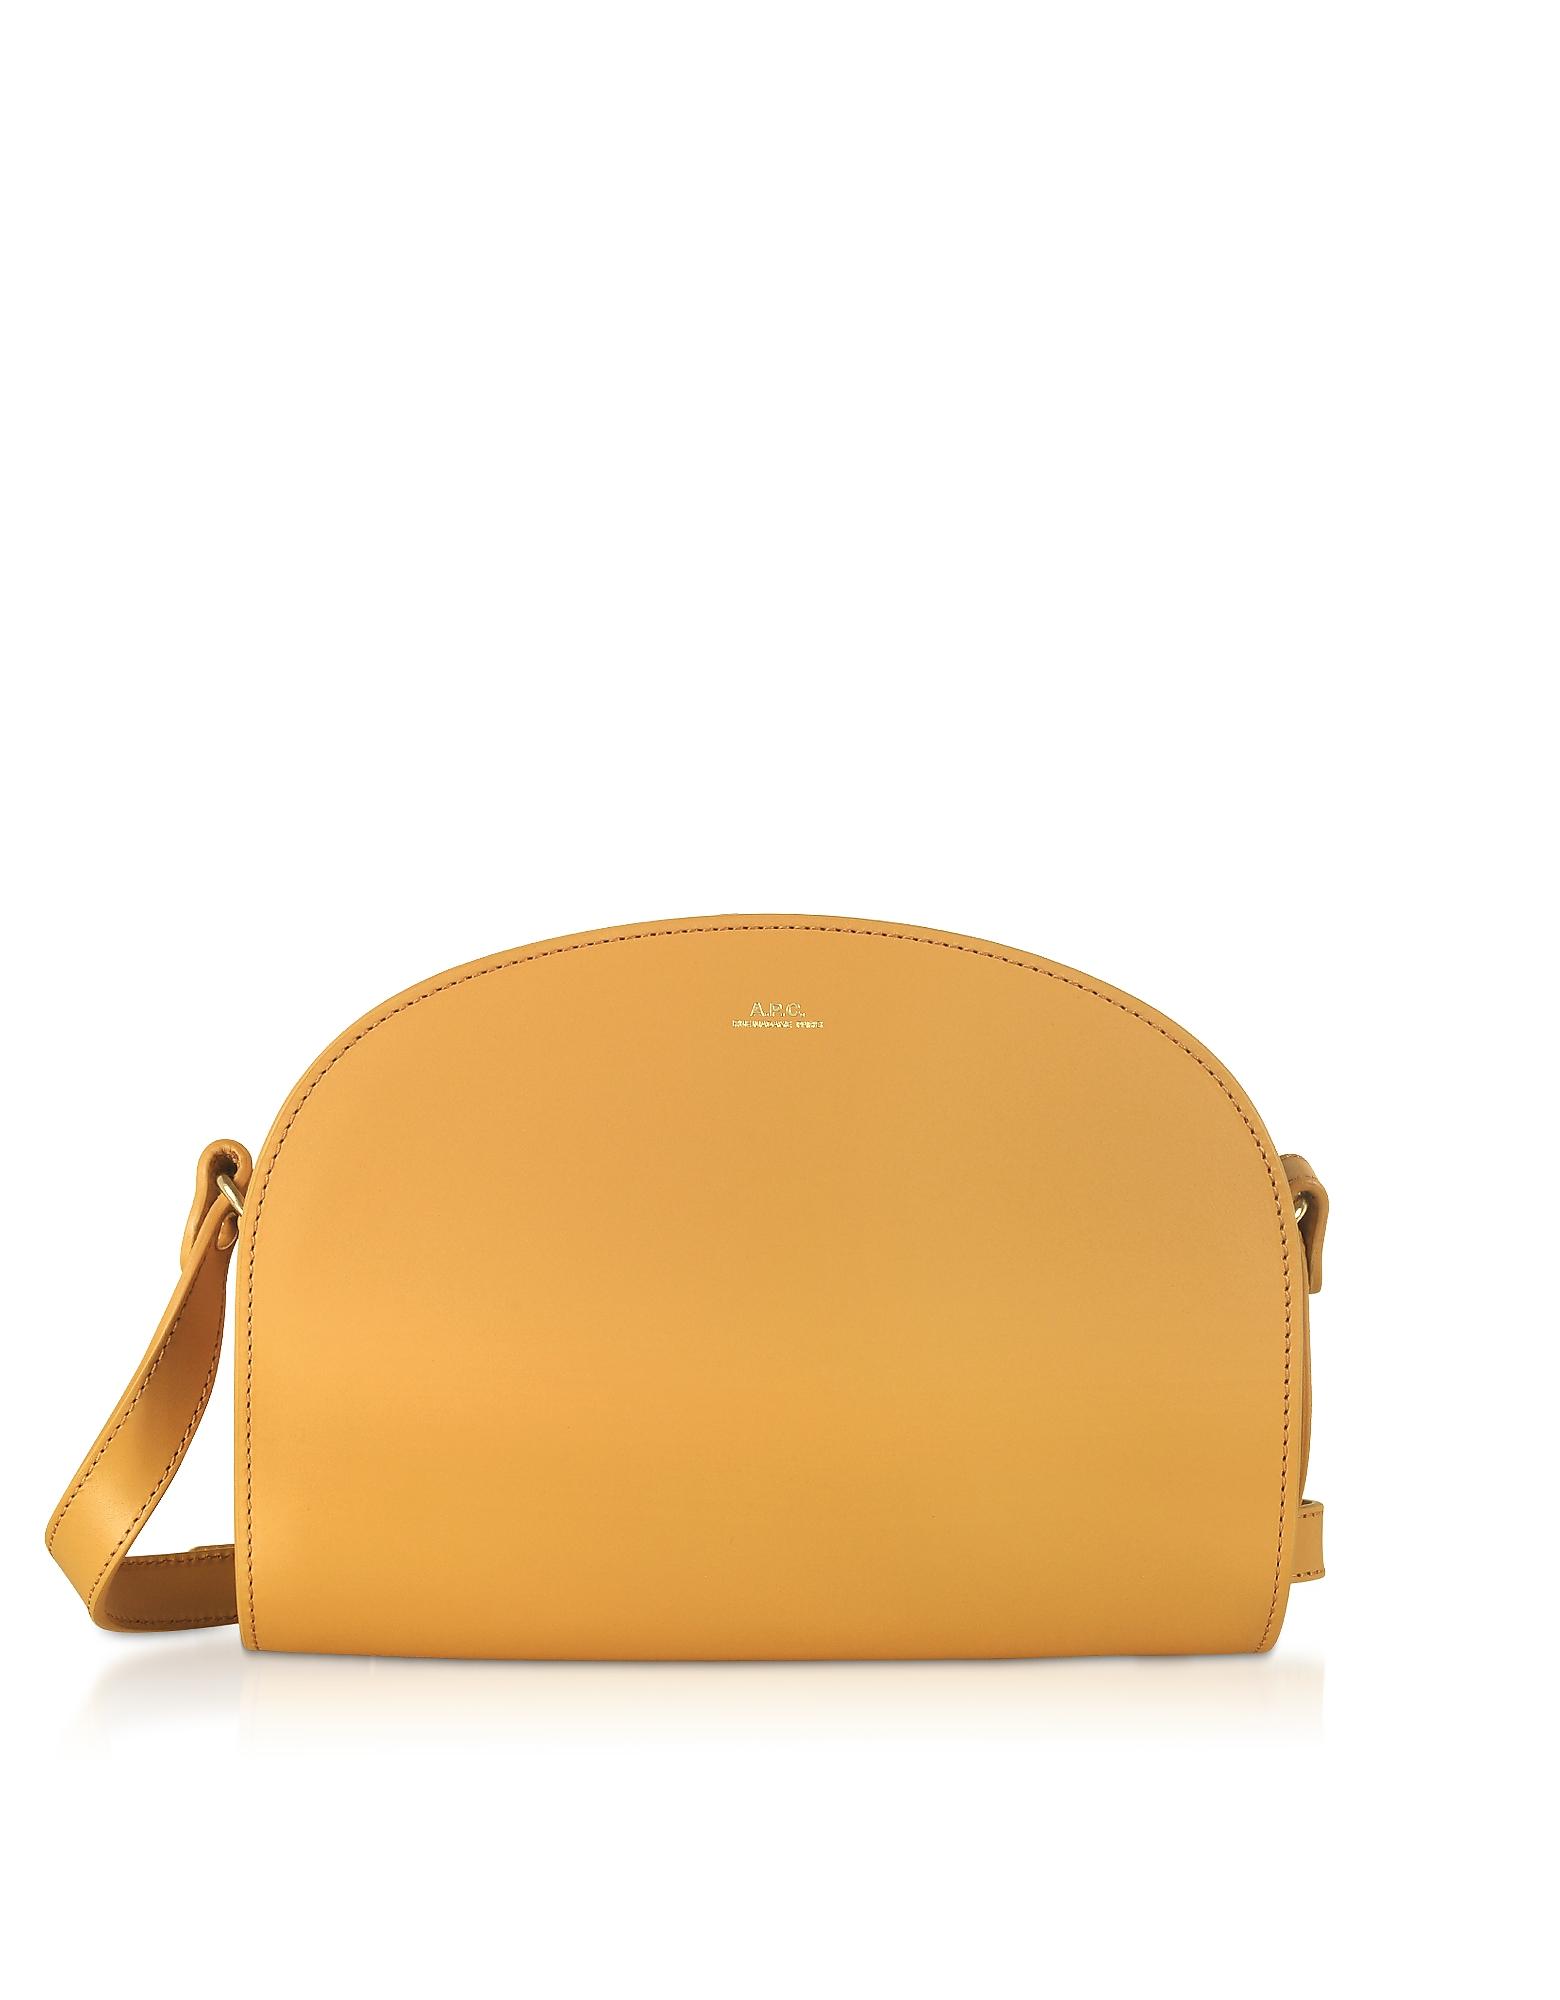 A.P.C. Designer Handbags, Half Moon Smooth Leather Crossbody Bag